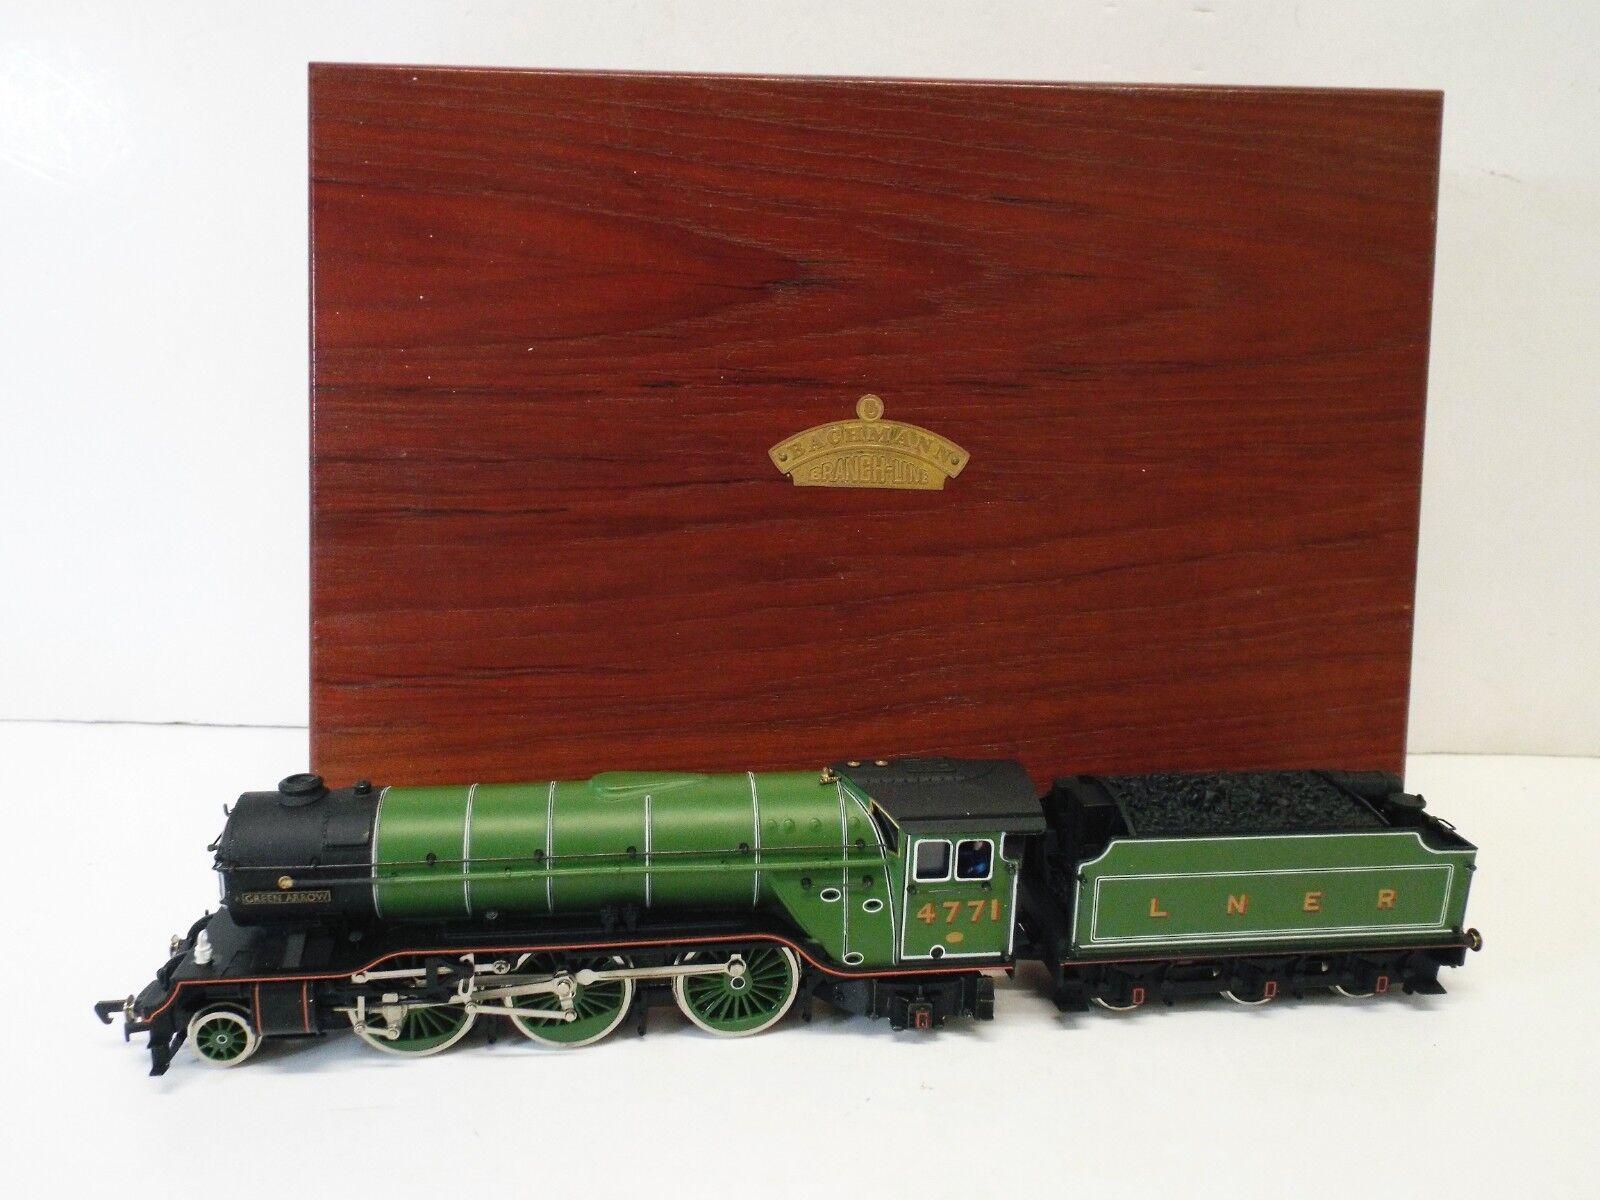 BACHMANN BRANSCHLINE grön AROW 4771 BEGRÄNSAD UTION I trä låda (OOS880)